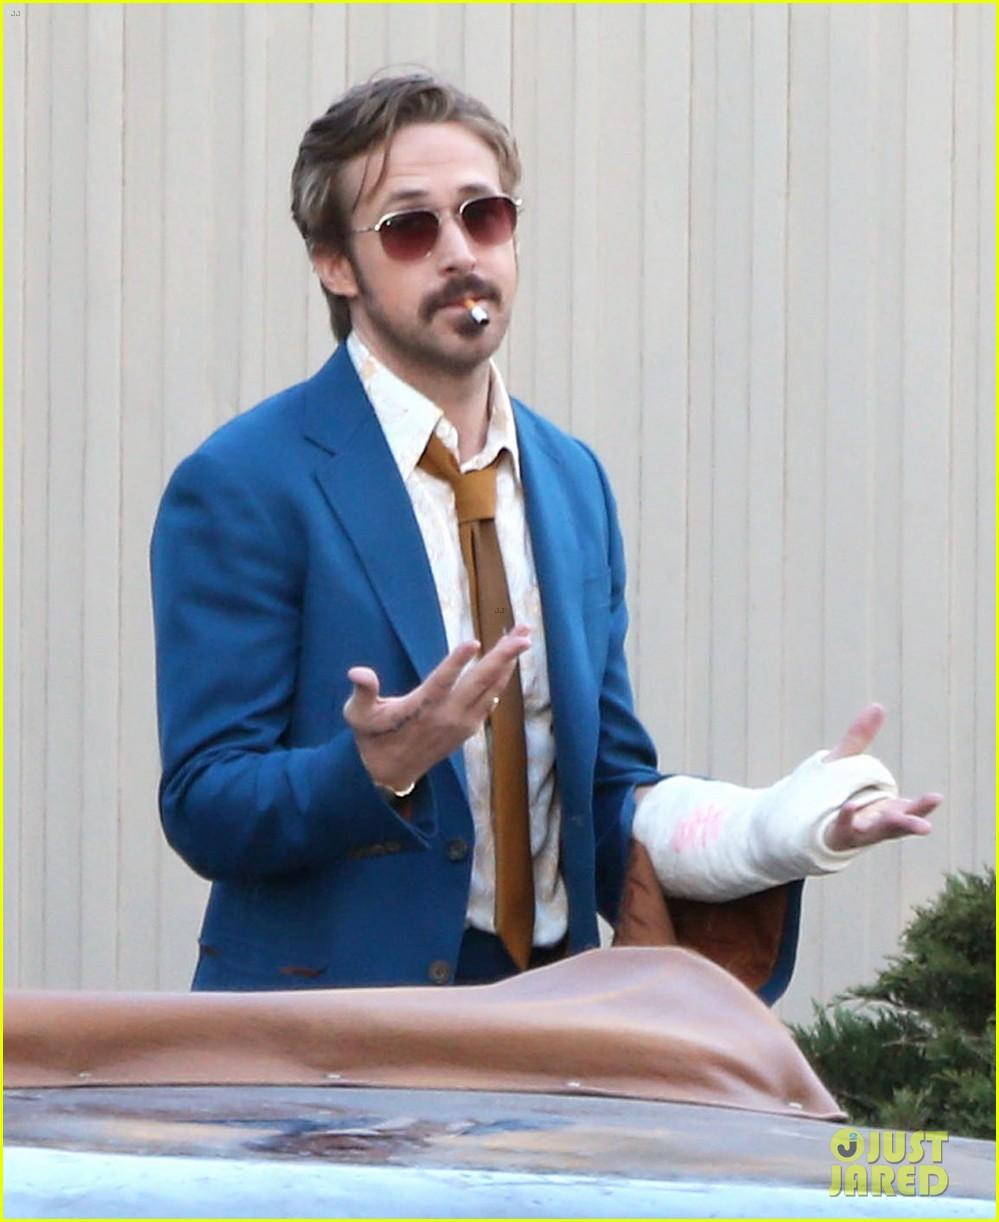 ryan gosling cherishing every minute of fatherhood 073290000